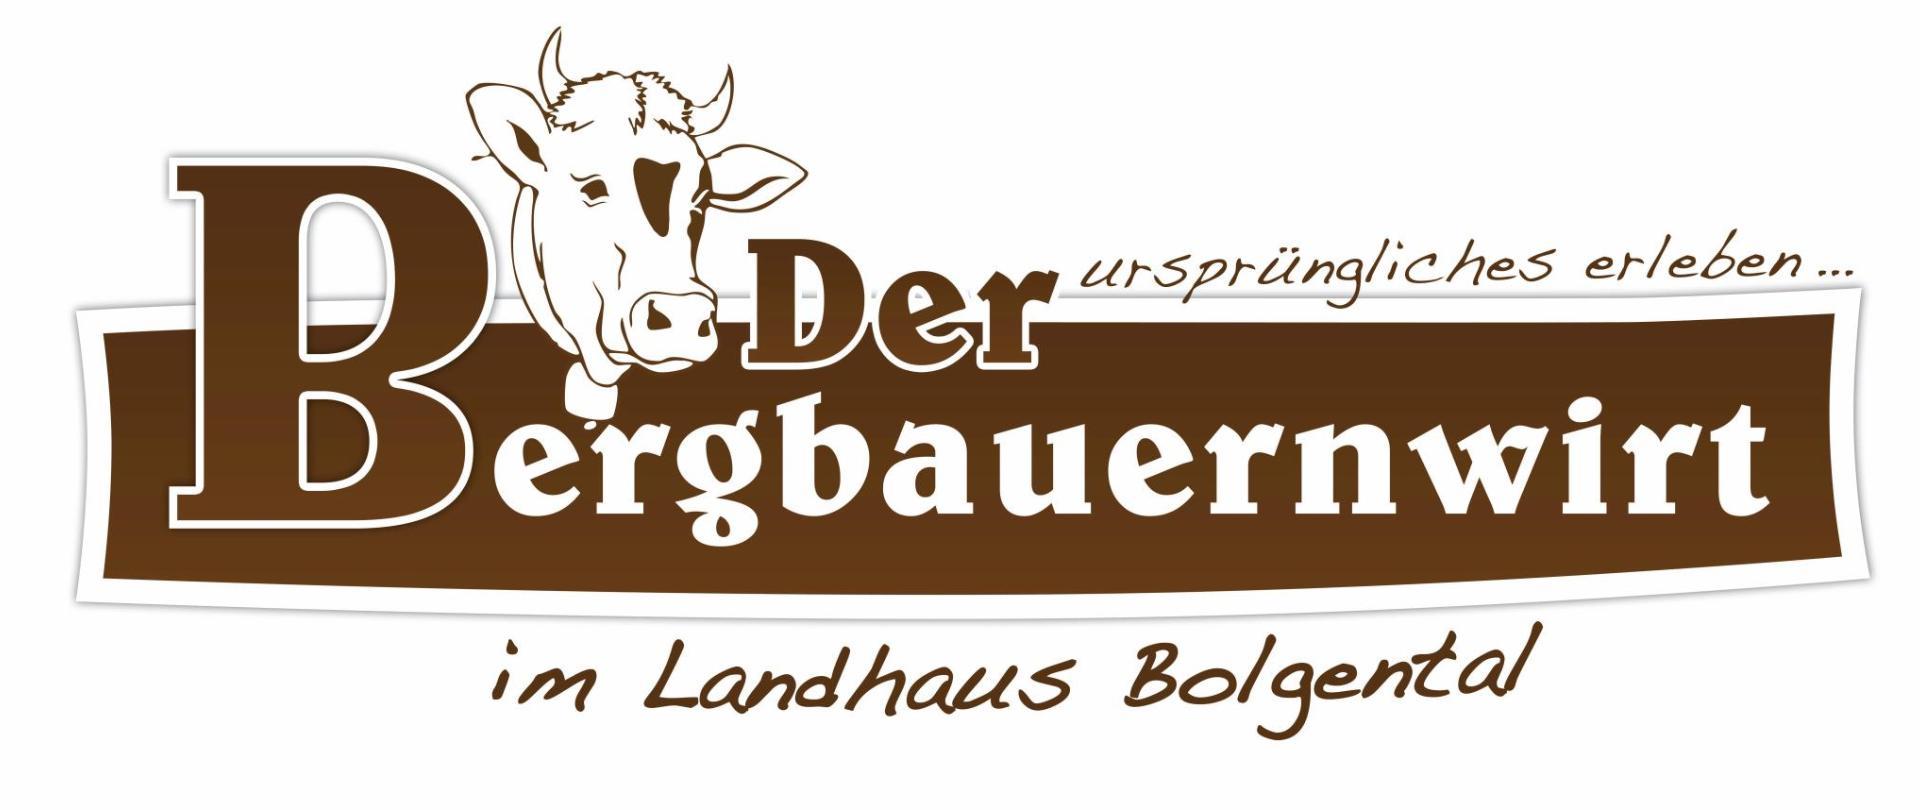 DerBergbauernwirt_Logo.jpg